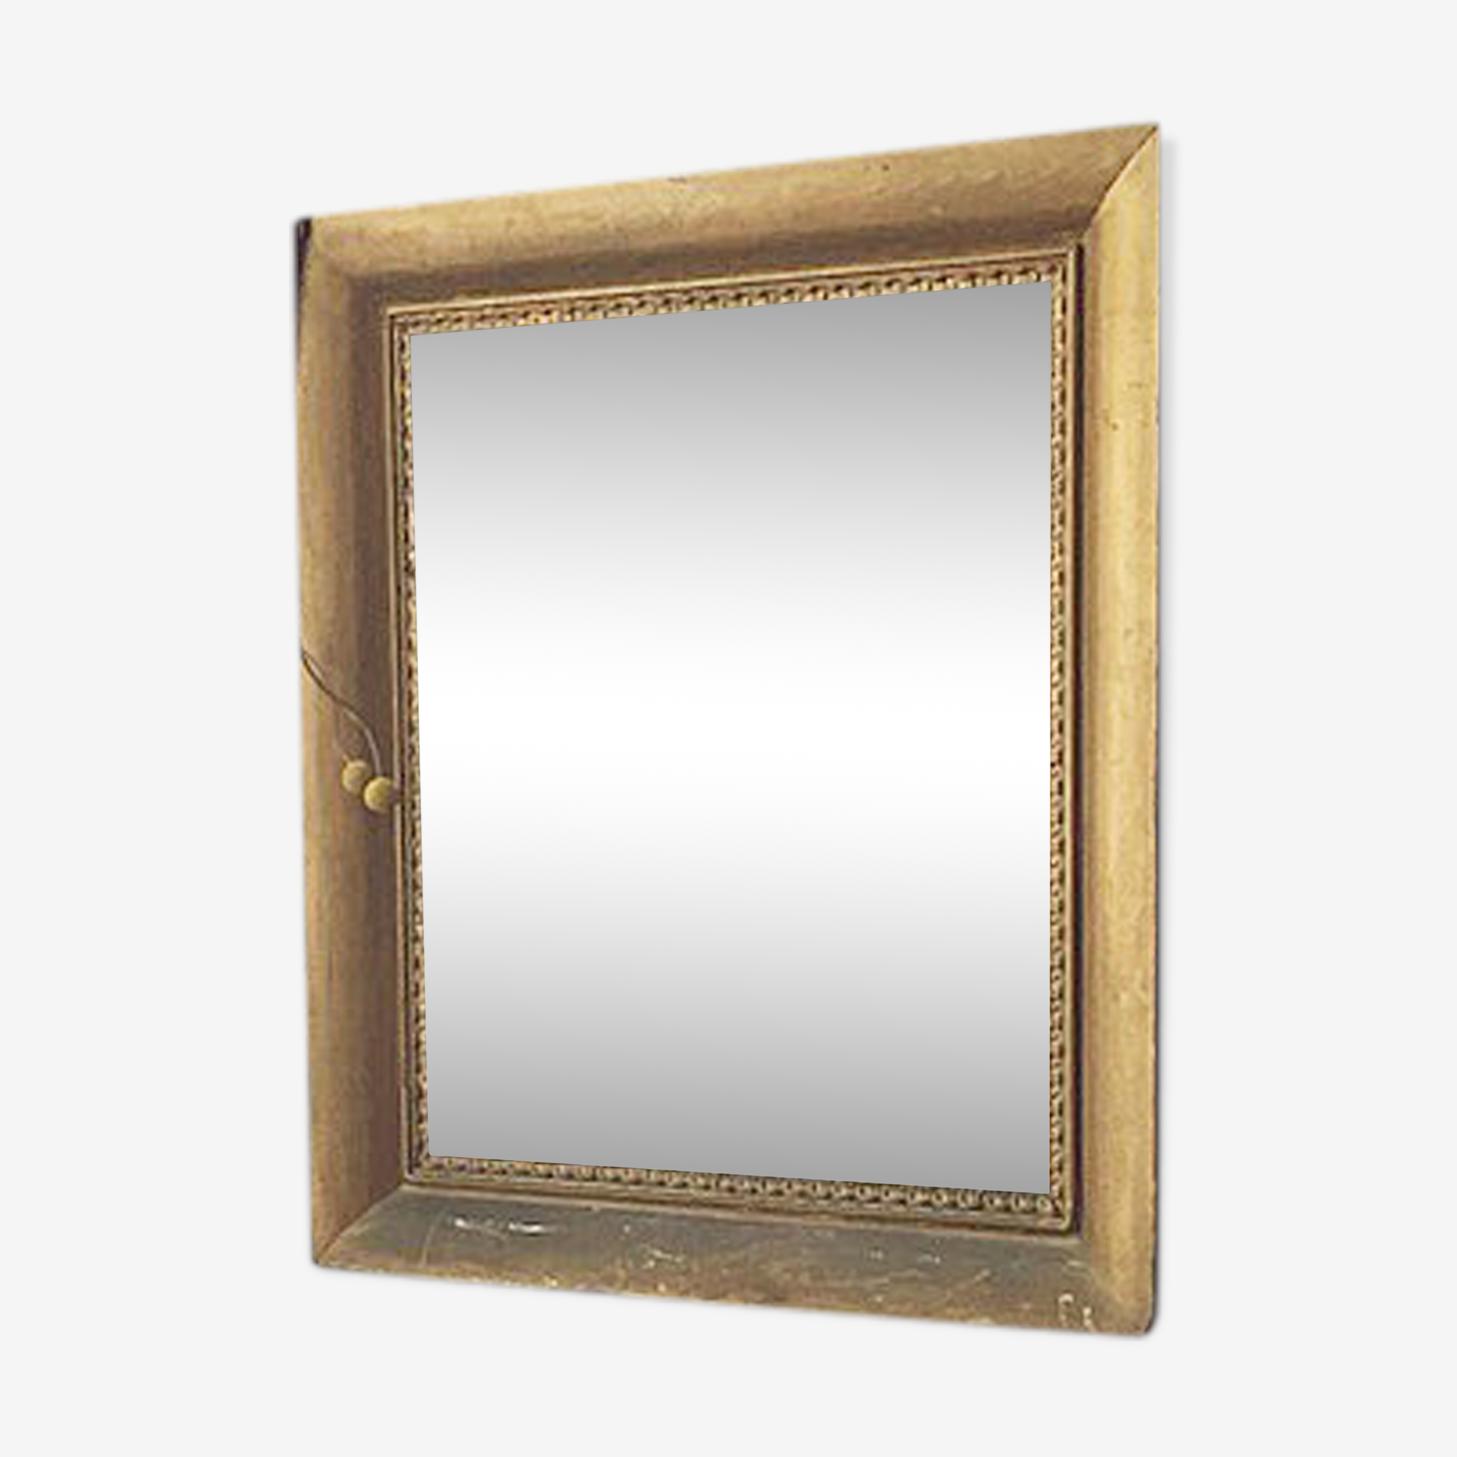 Golden rectangle mirror 68 x 77 cm